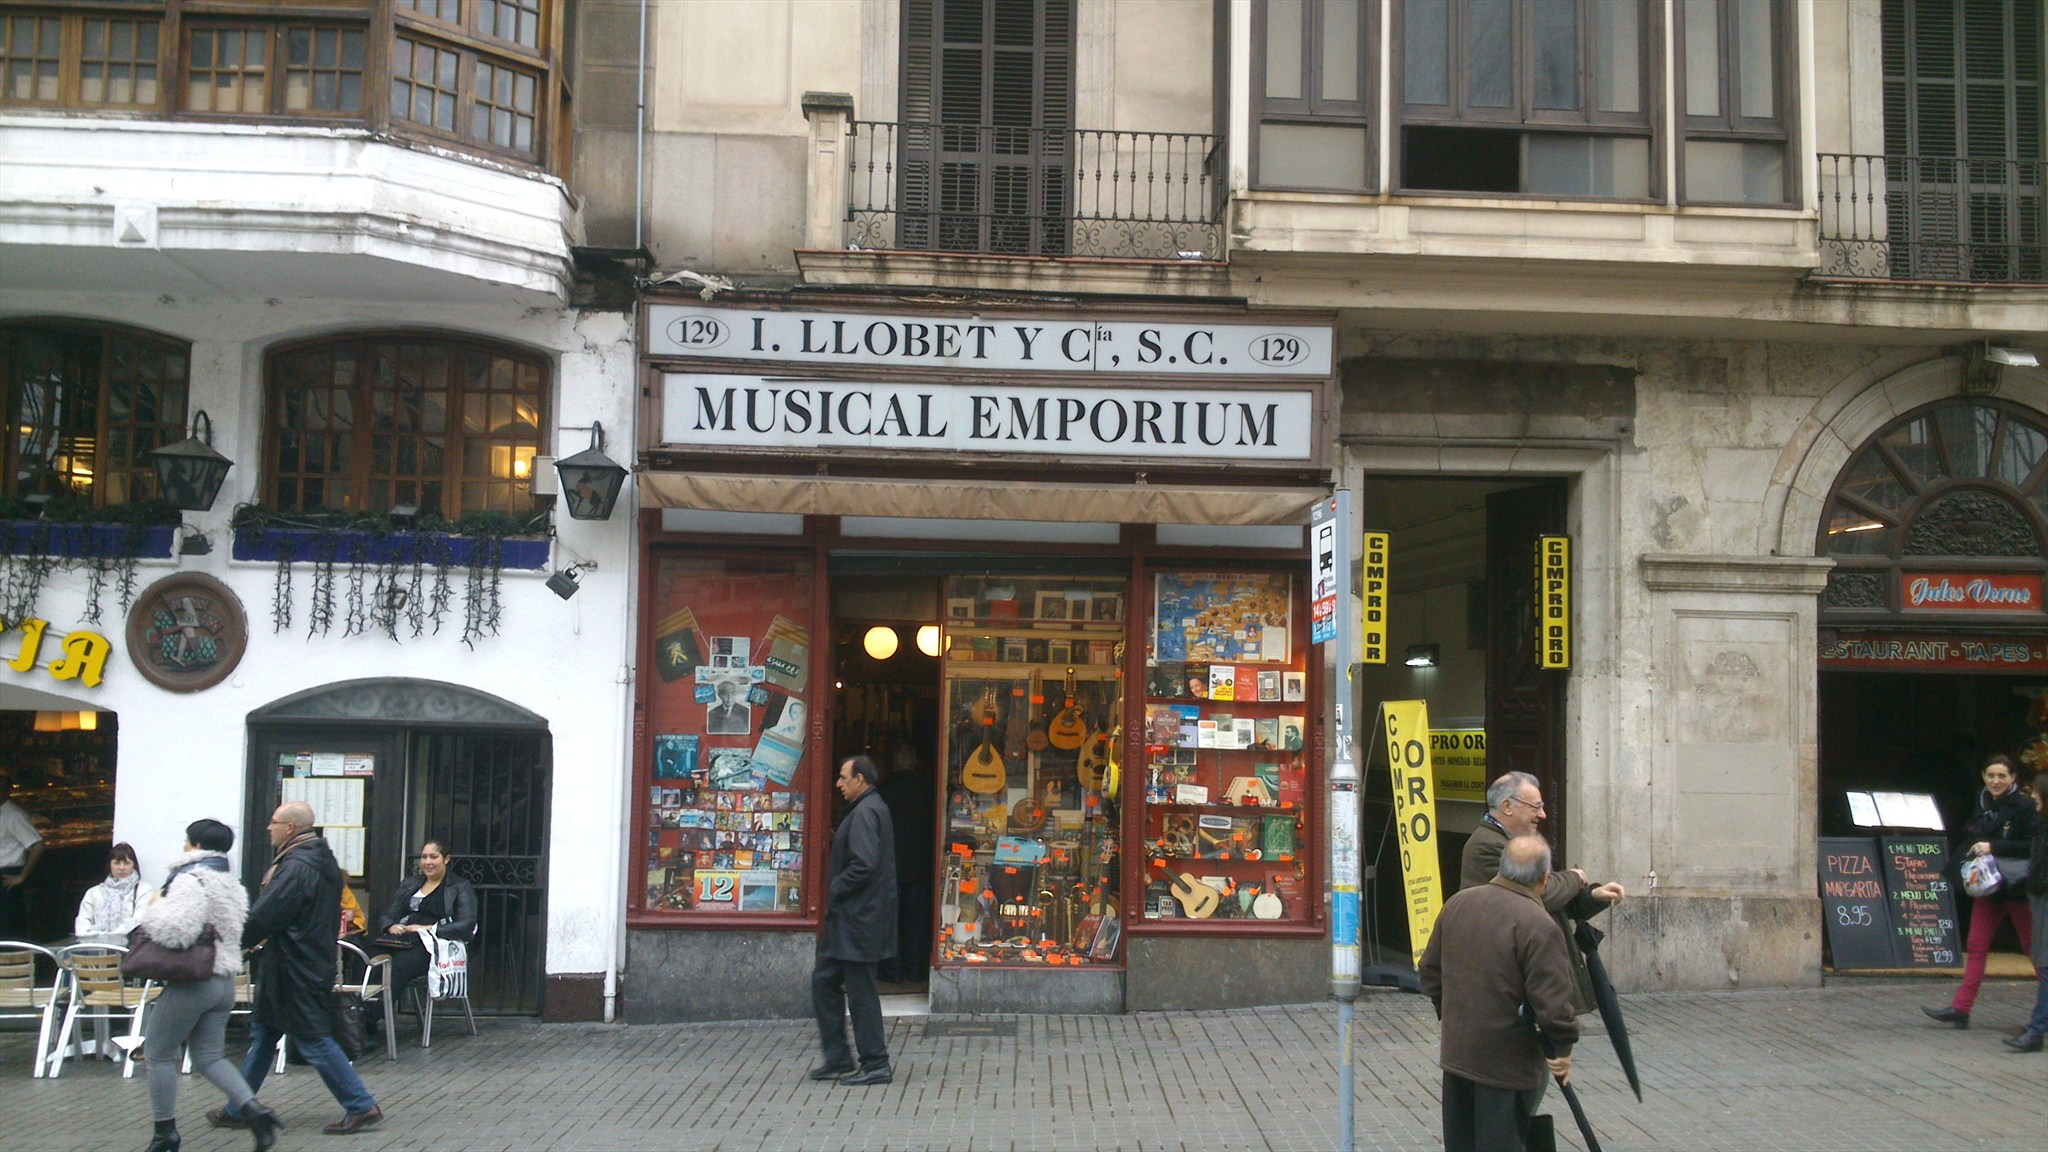 Resultado de imagen de musical emporium barcelona